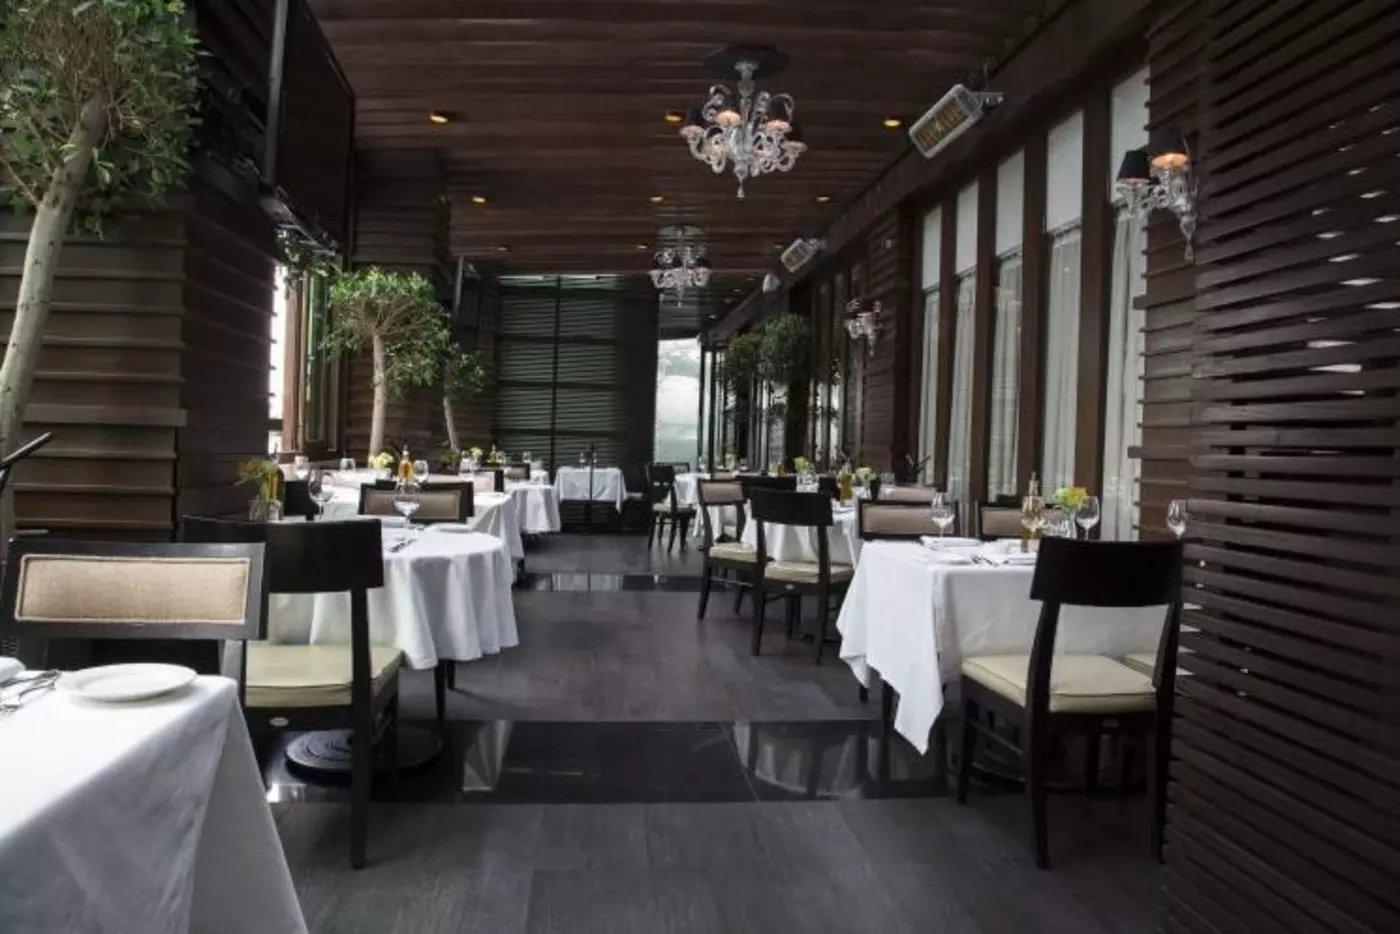 Best steakhouses in CDMX